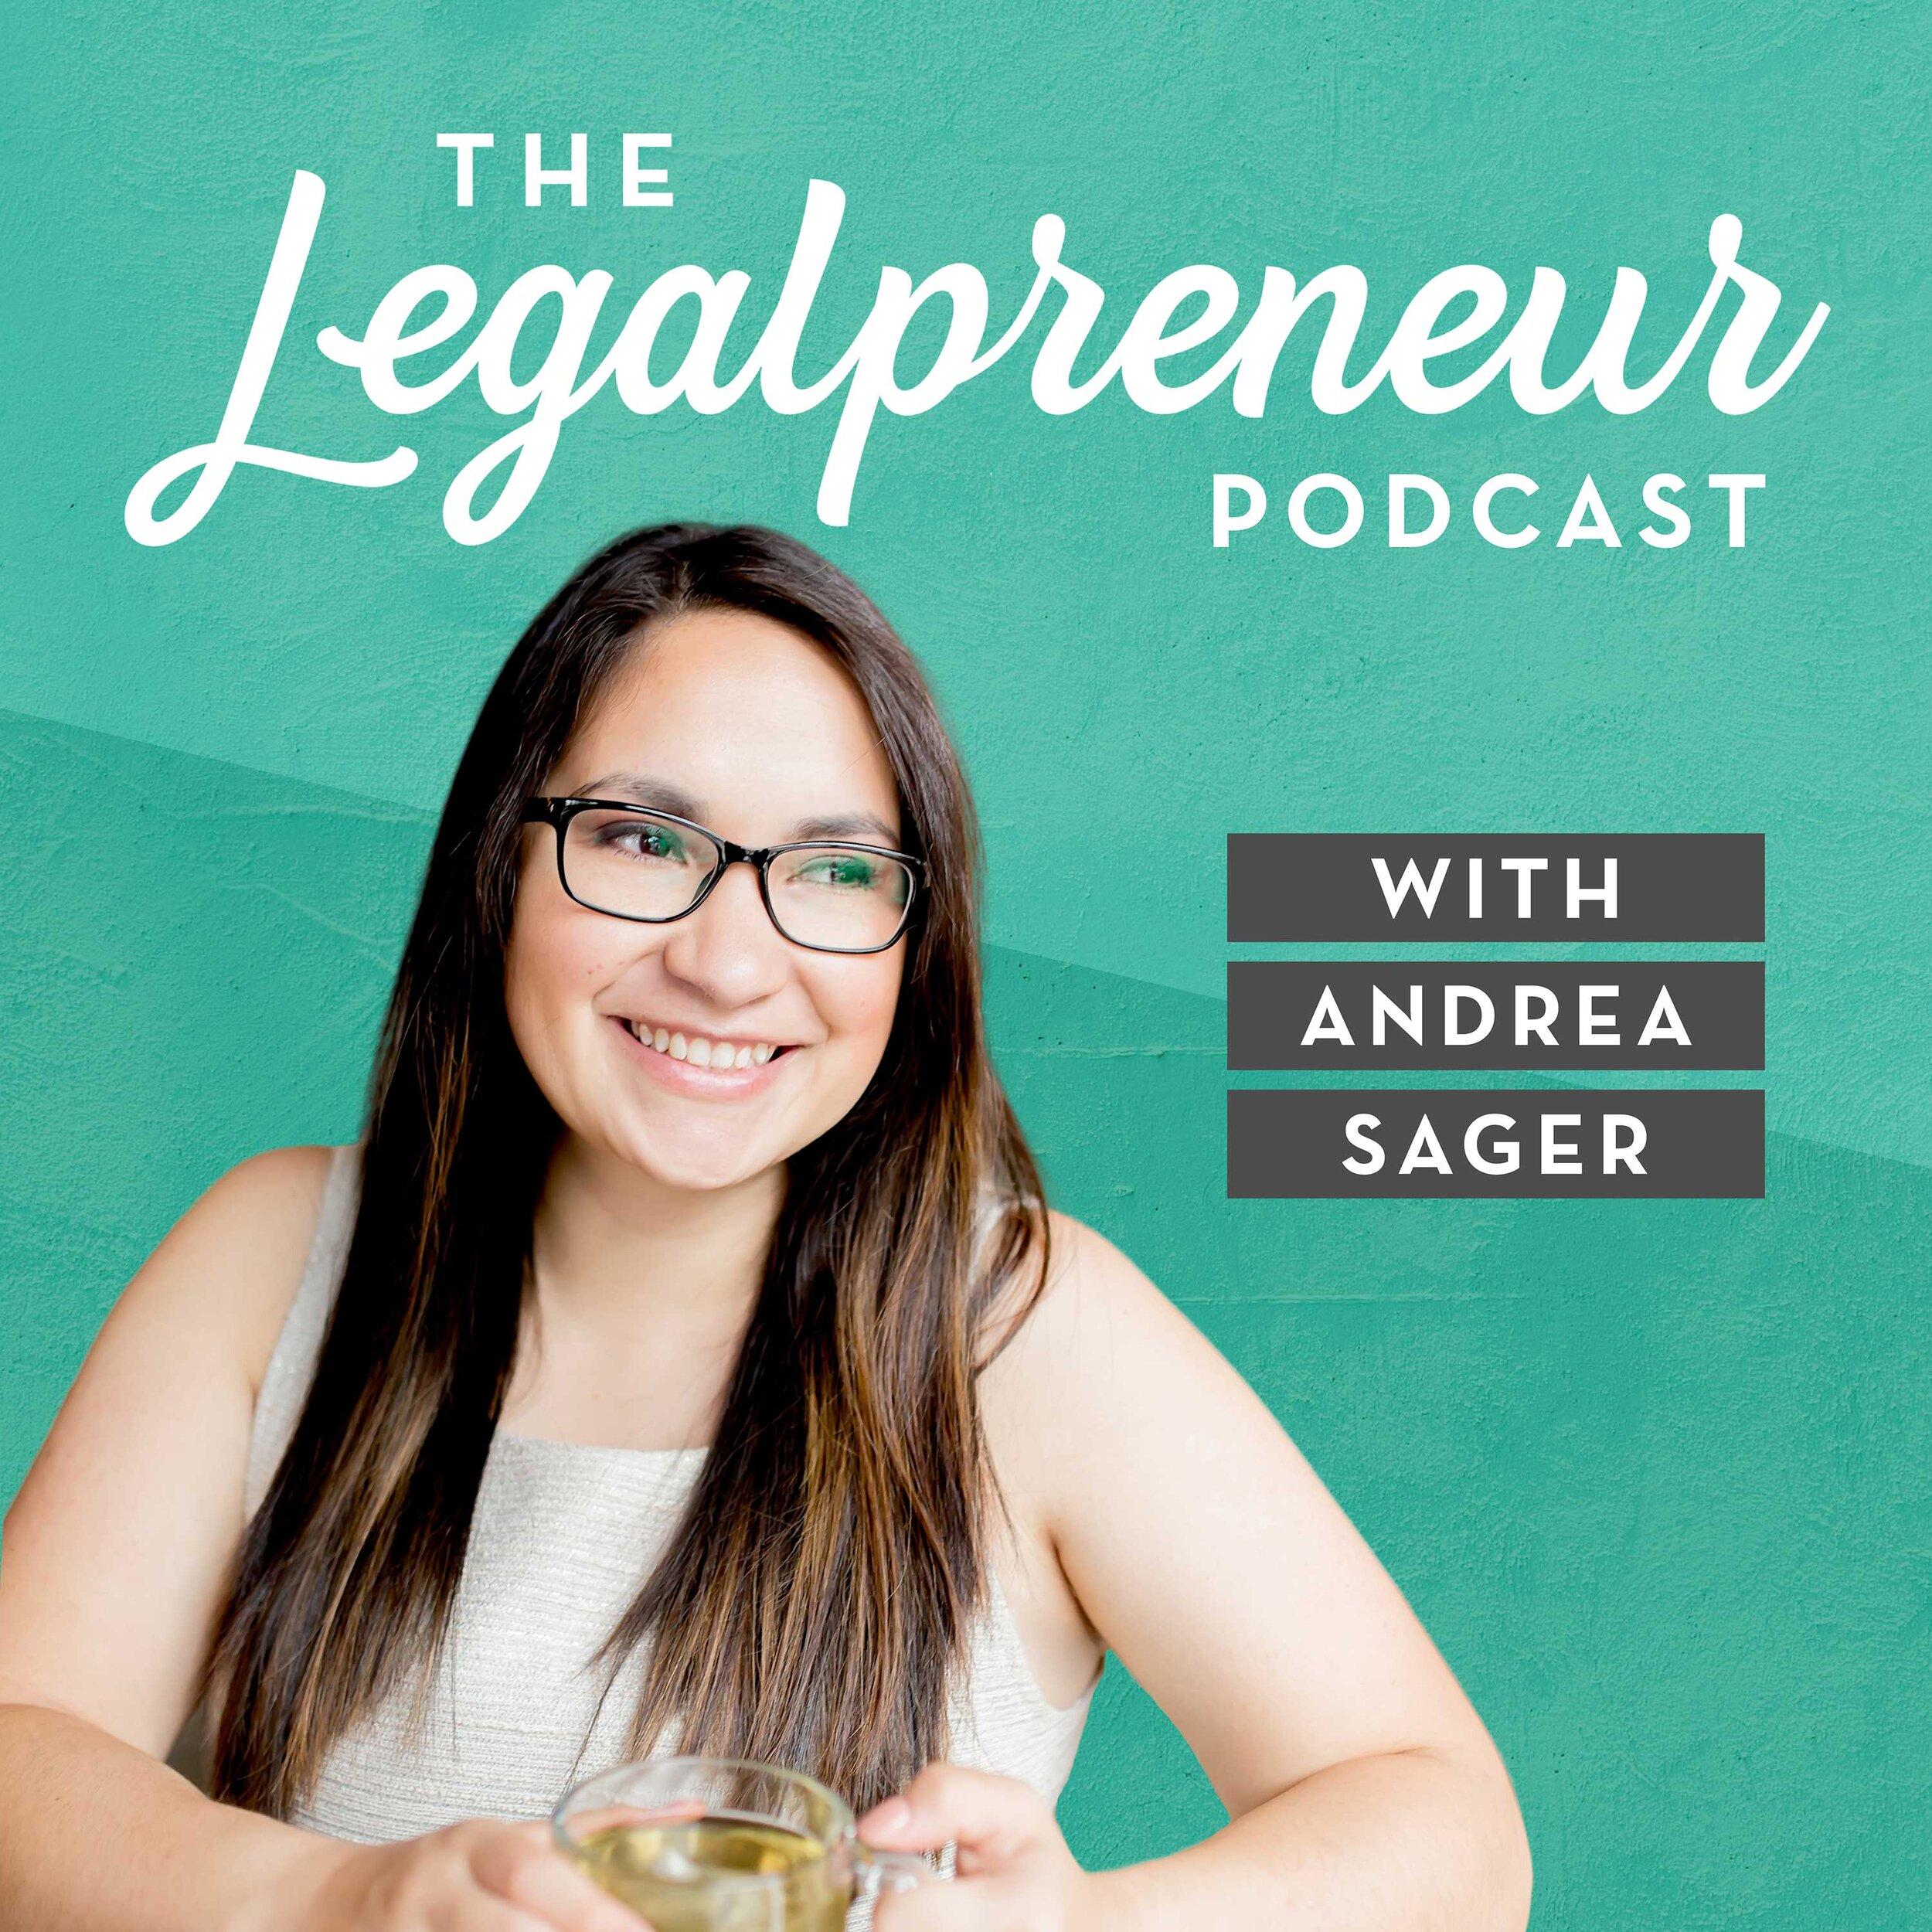 Andrea-Sager-Podcast-Cover-Art.jpg